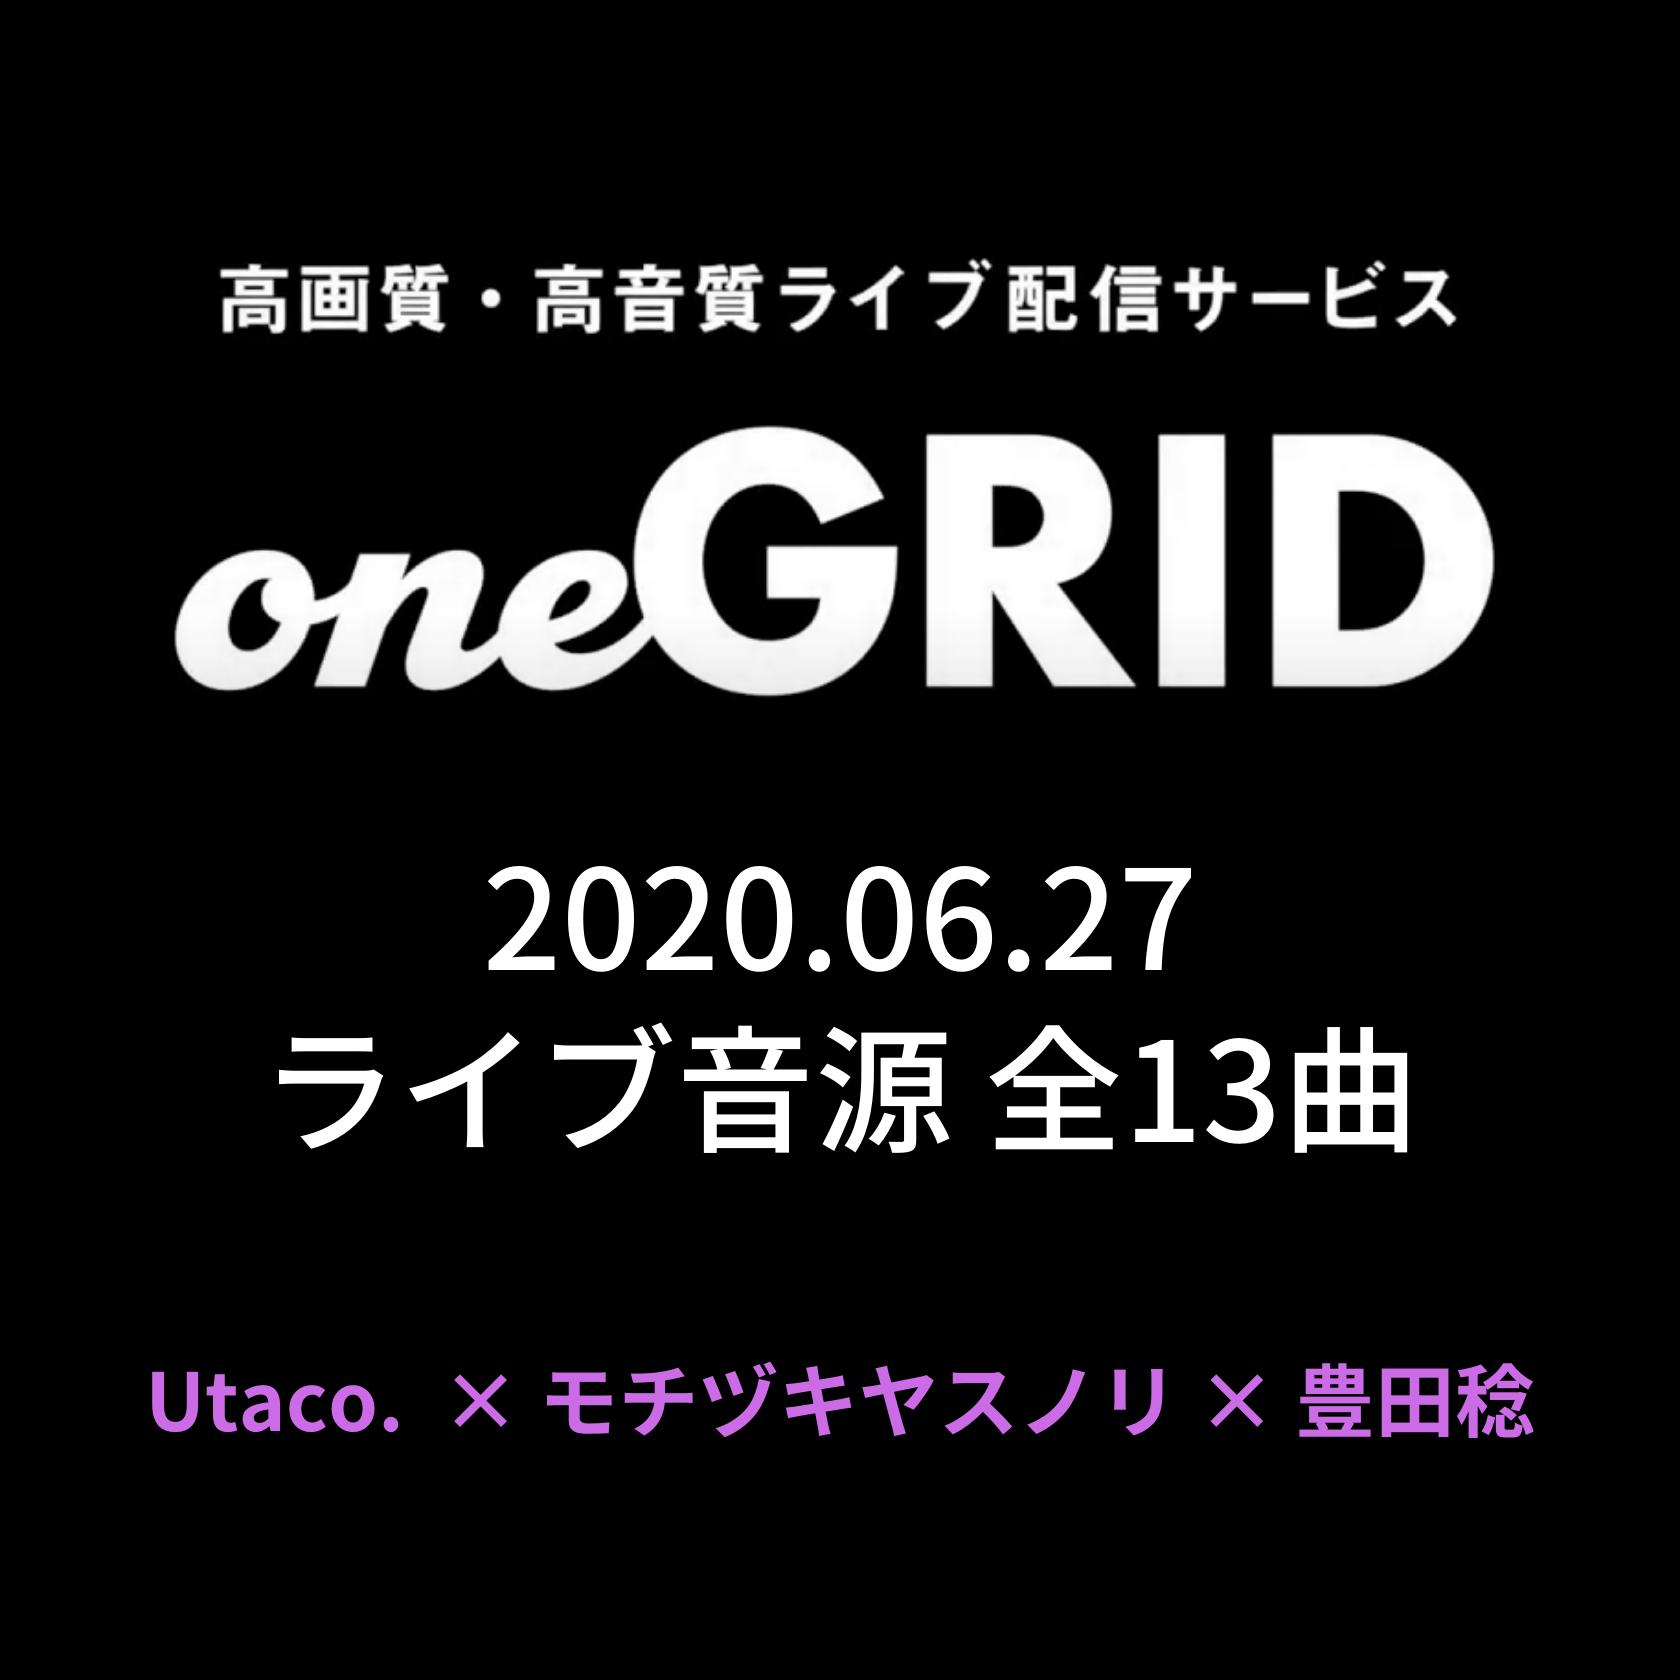 6/27 Utaco. × モチヅキヤスノリ × 豊田稔 Live音源 全13曲